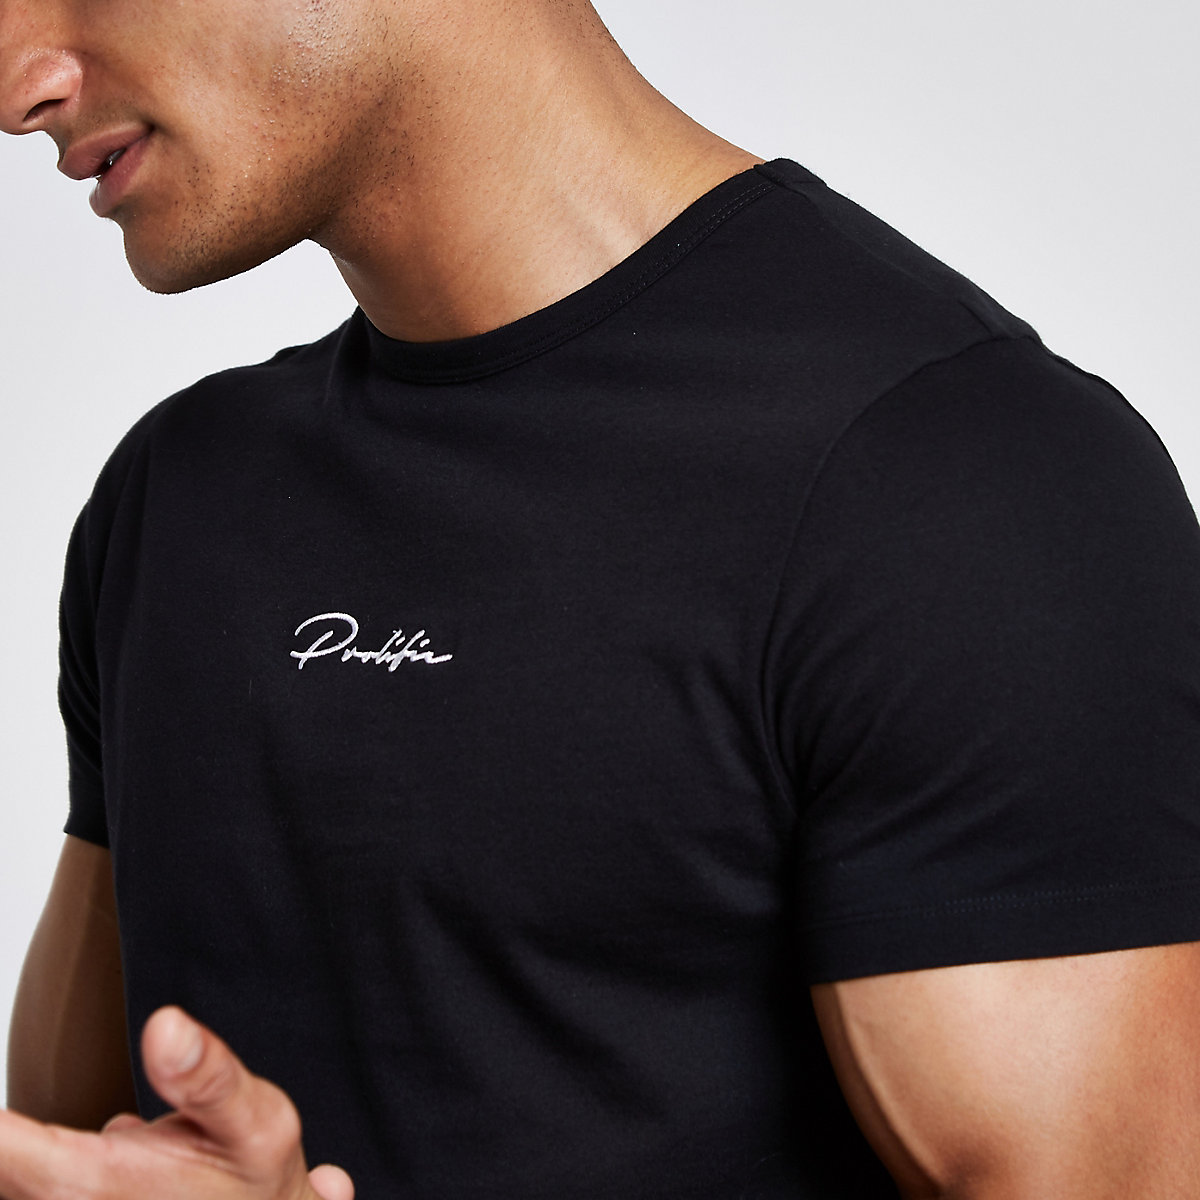 Black 'prolific' muscle fit T-shirt